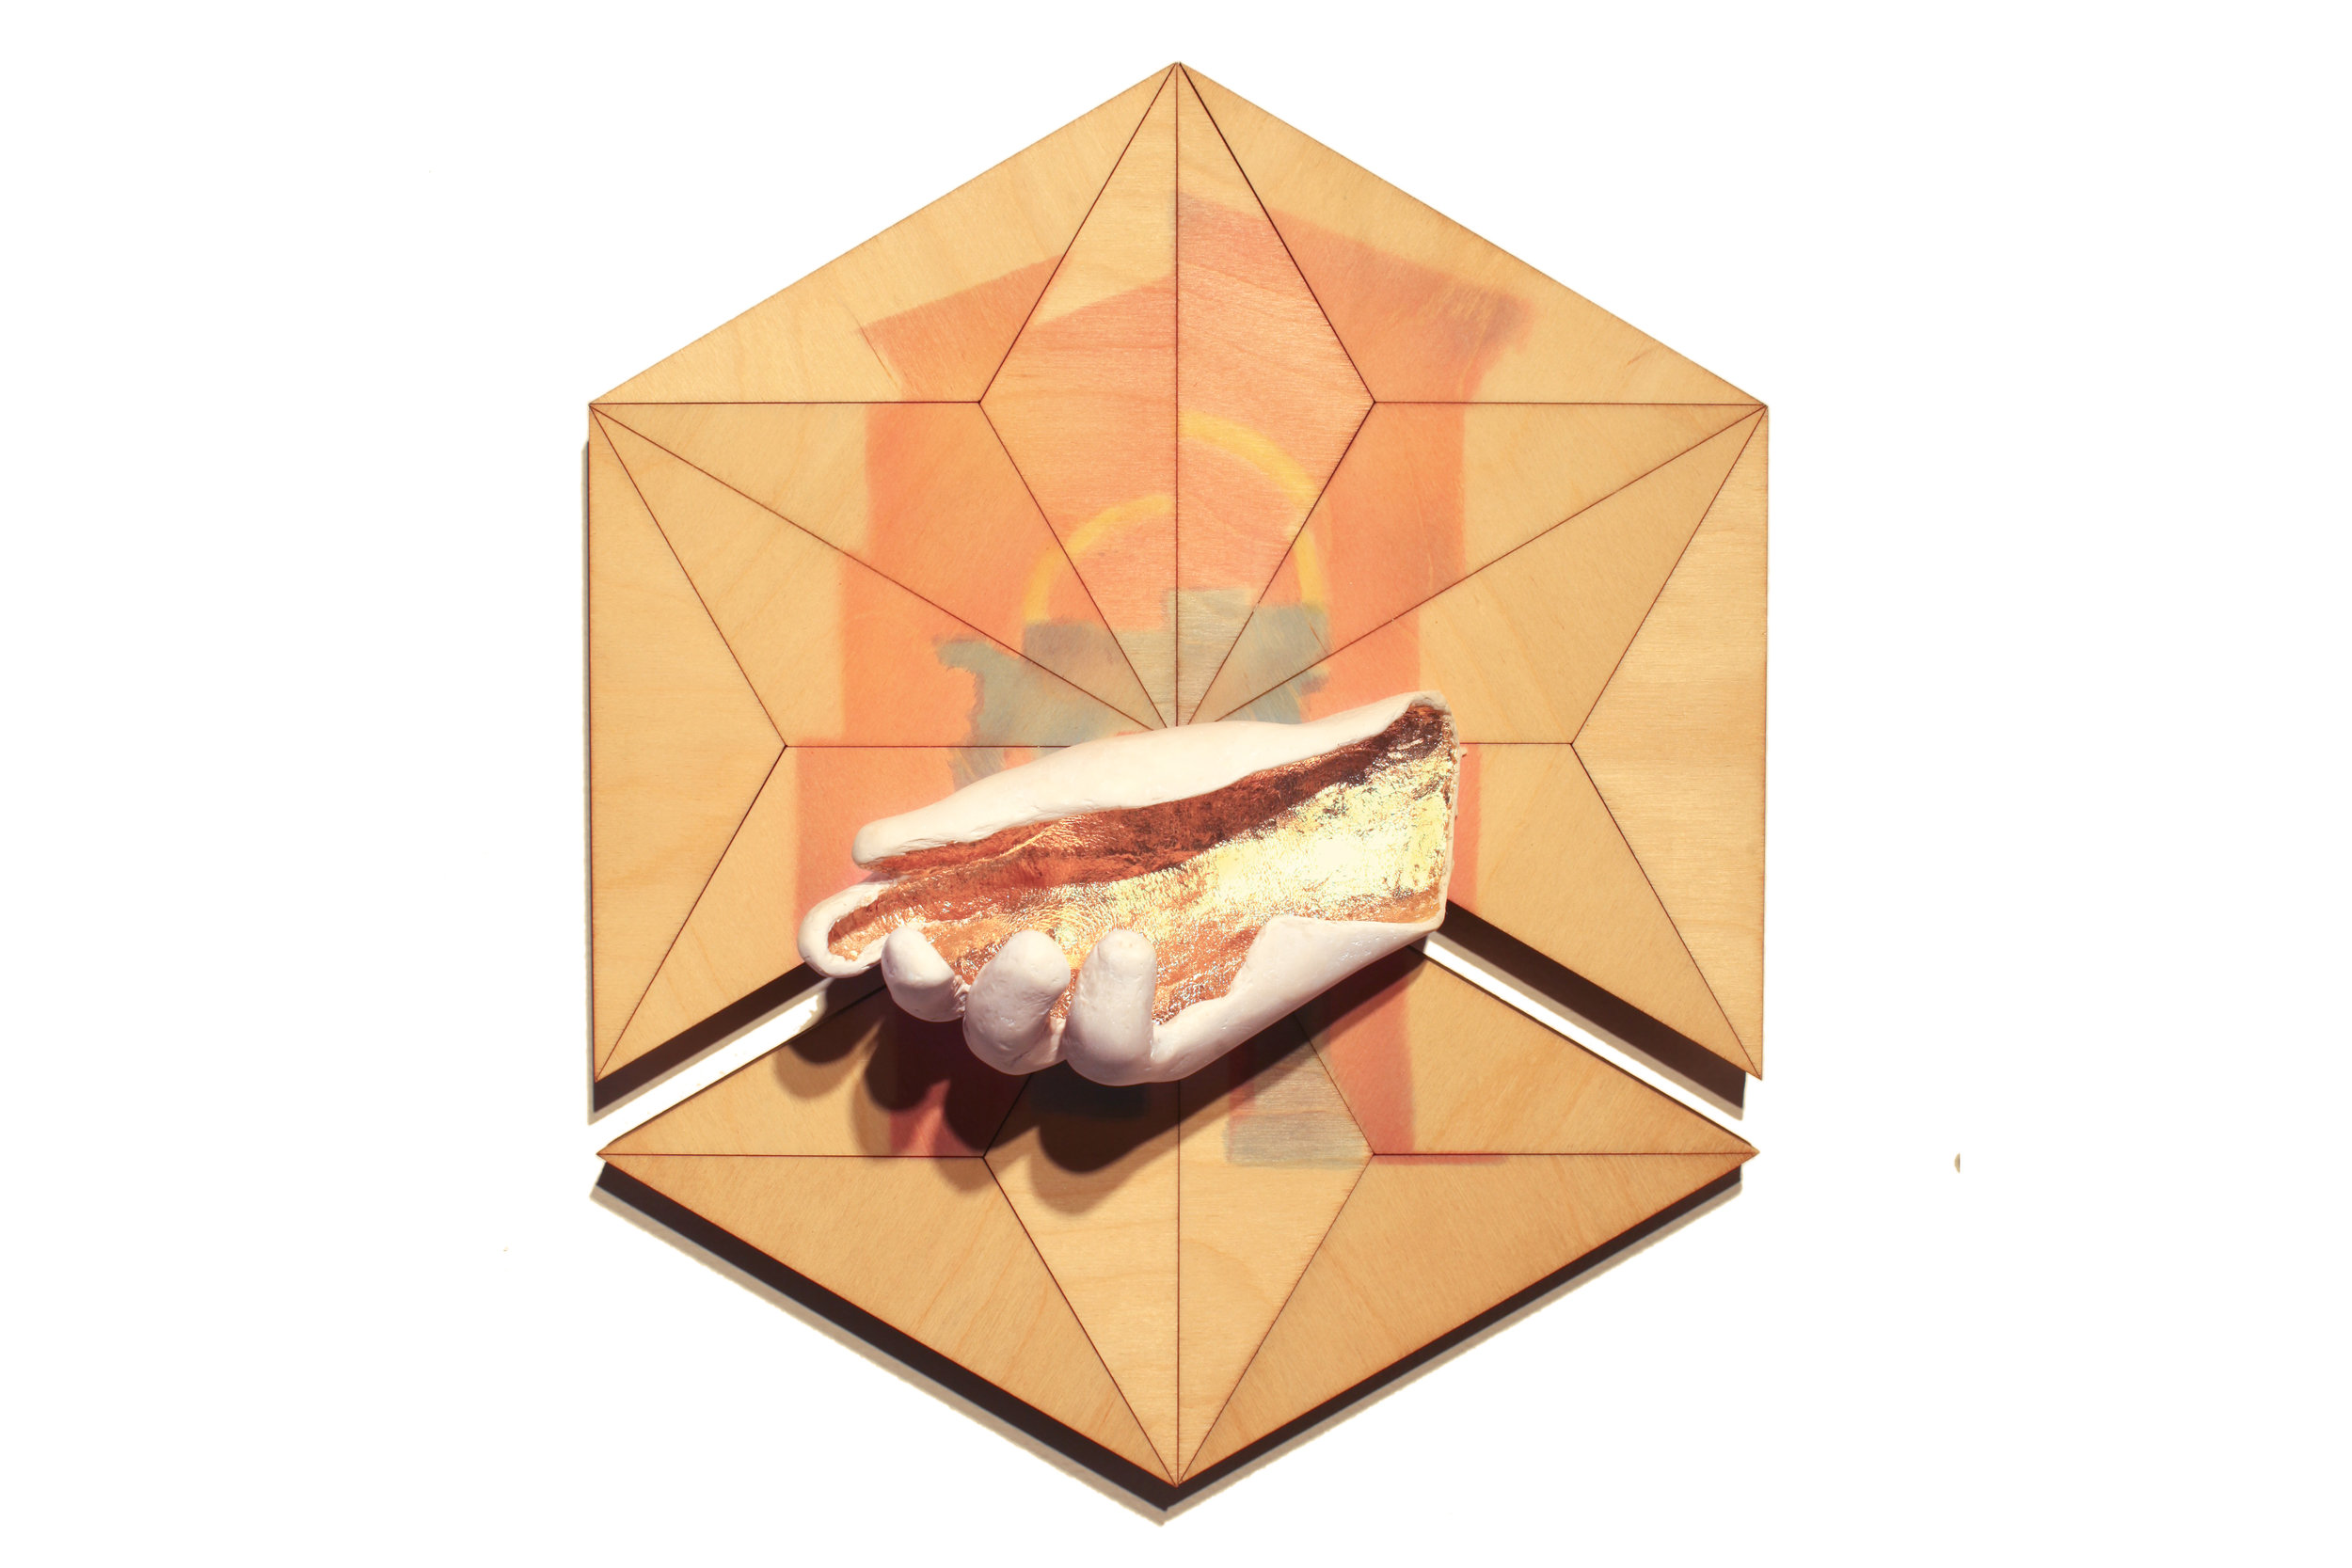 IMG_7329_squarespace.jpg